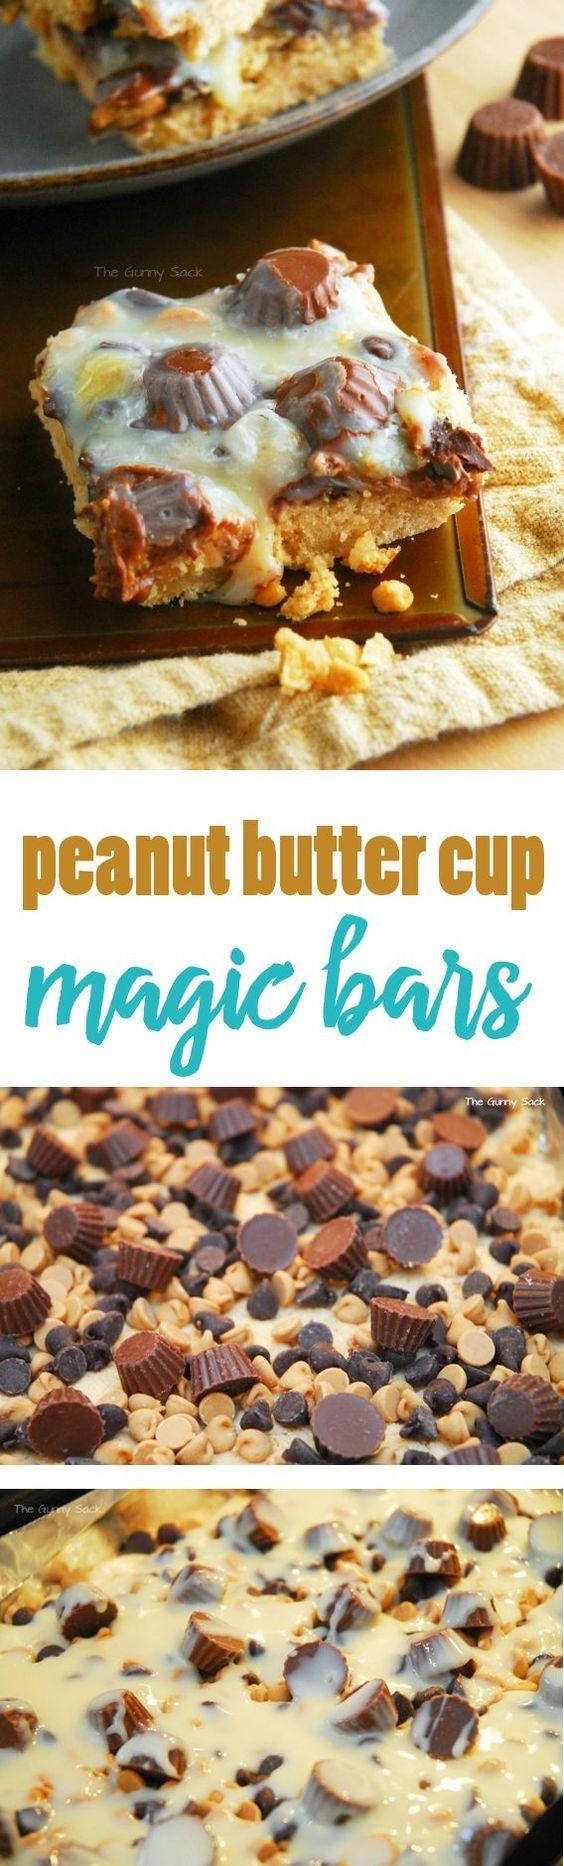 Peanut Butter Cup Magic Bars Recipe | Reese's Pe…